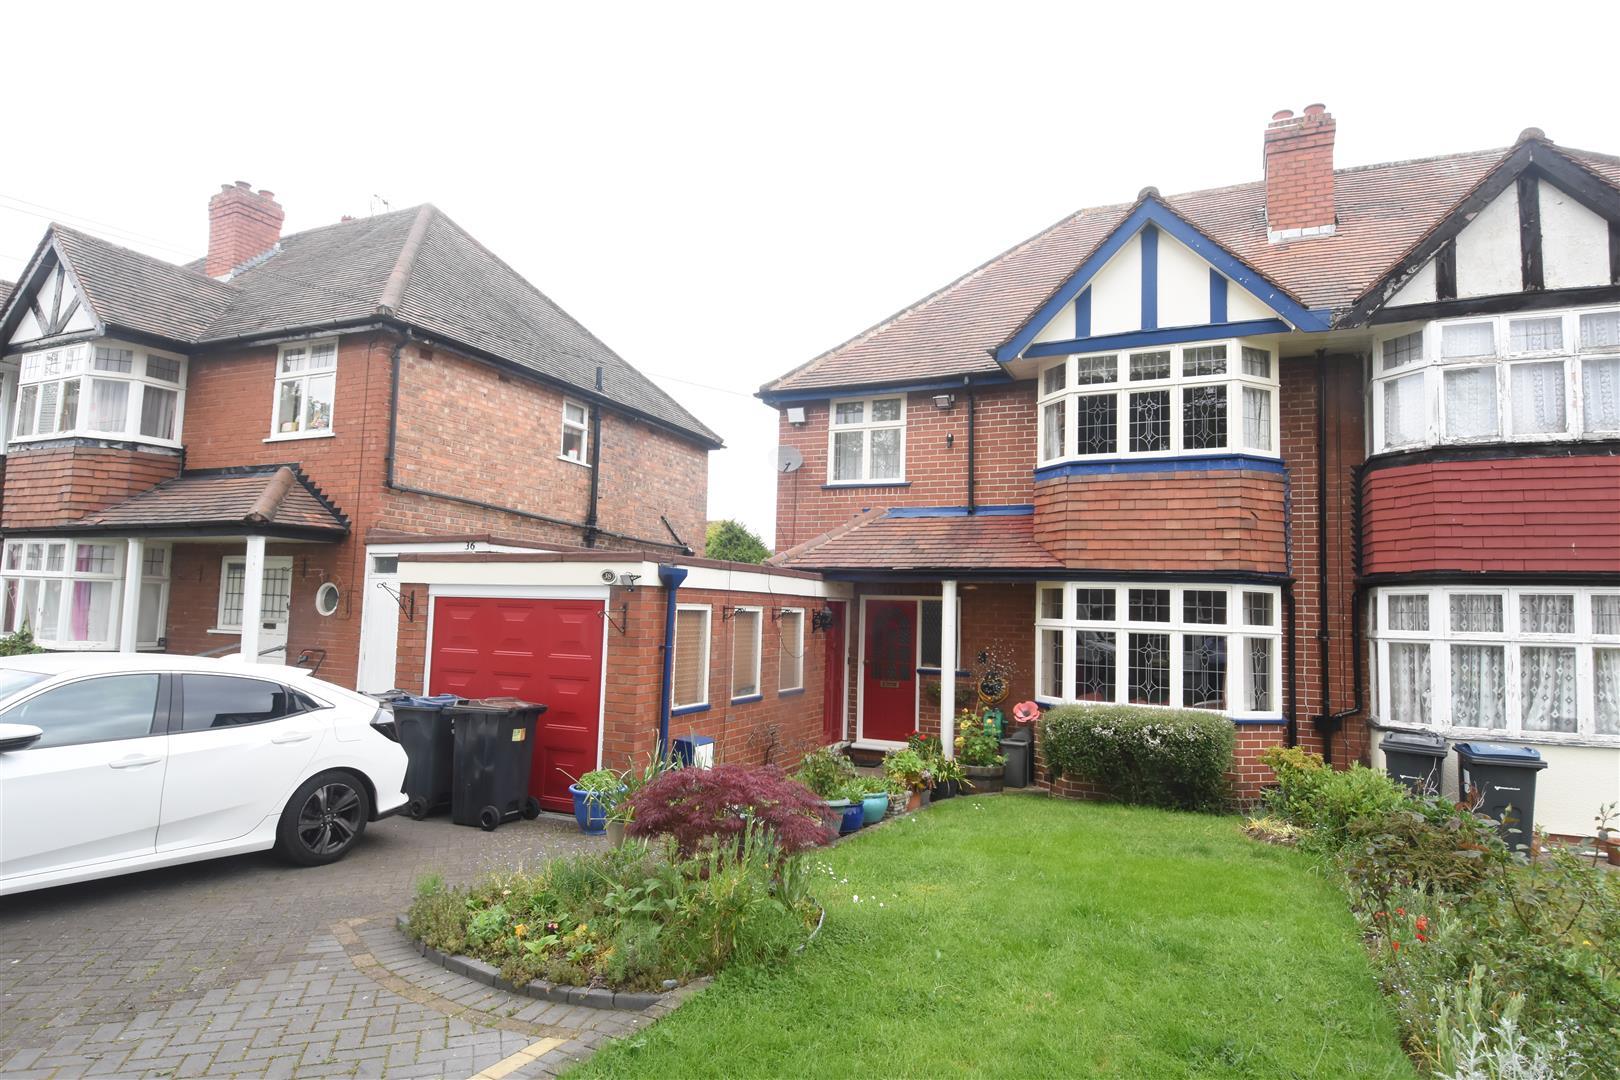 3 bed house for sale in Douglas Avenue, Birmingham, B36